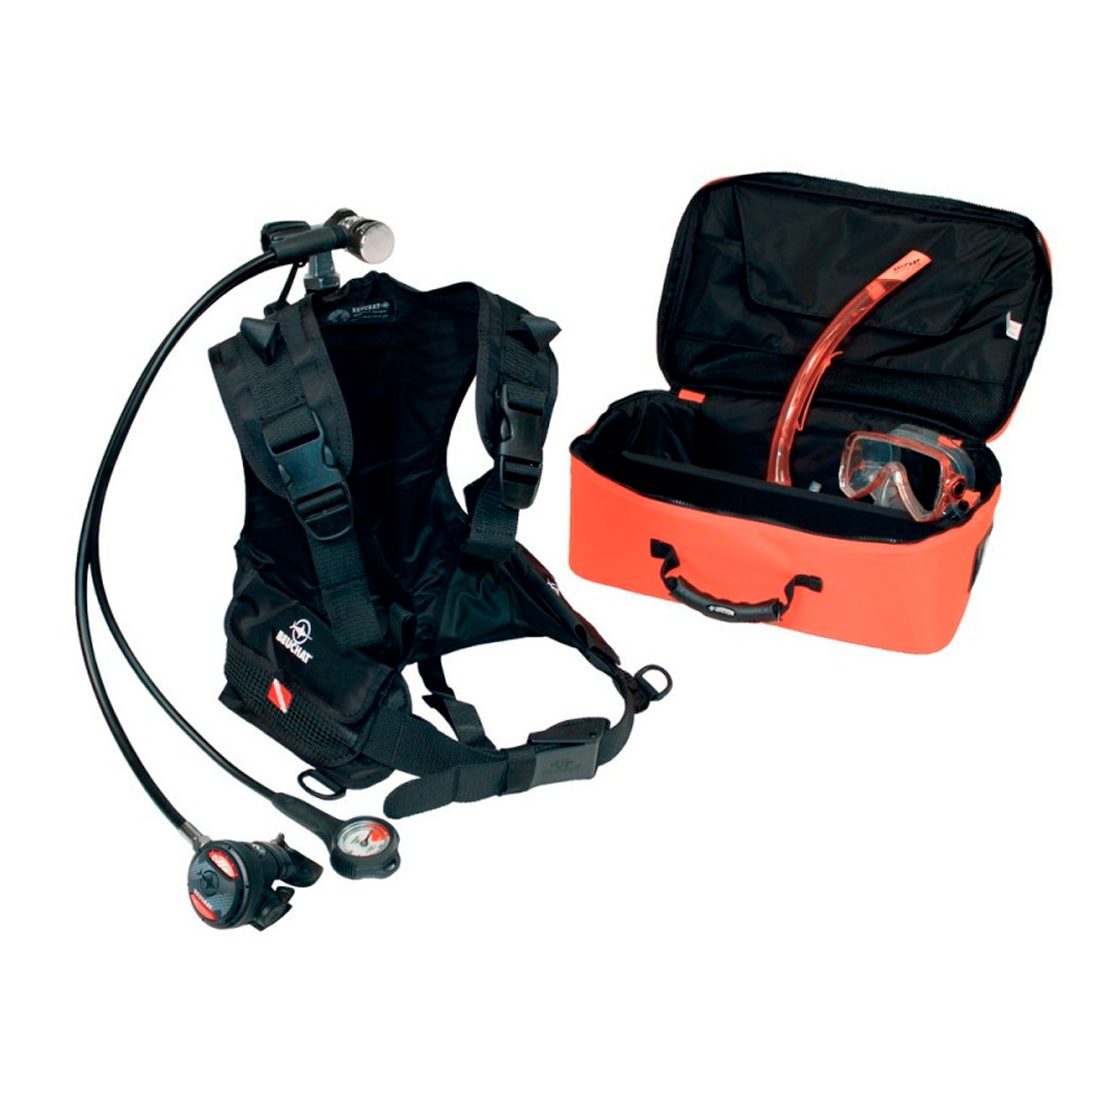 BEUCHAT - Boot Kit / Boardtauchgerät Atemregler-Set